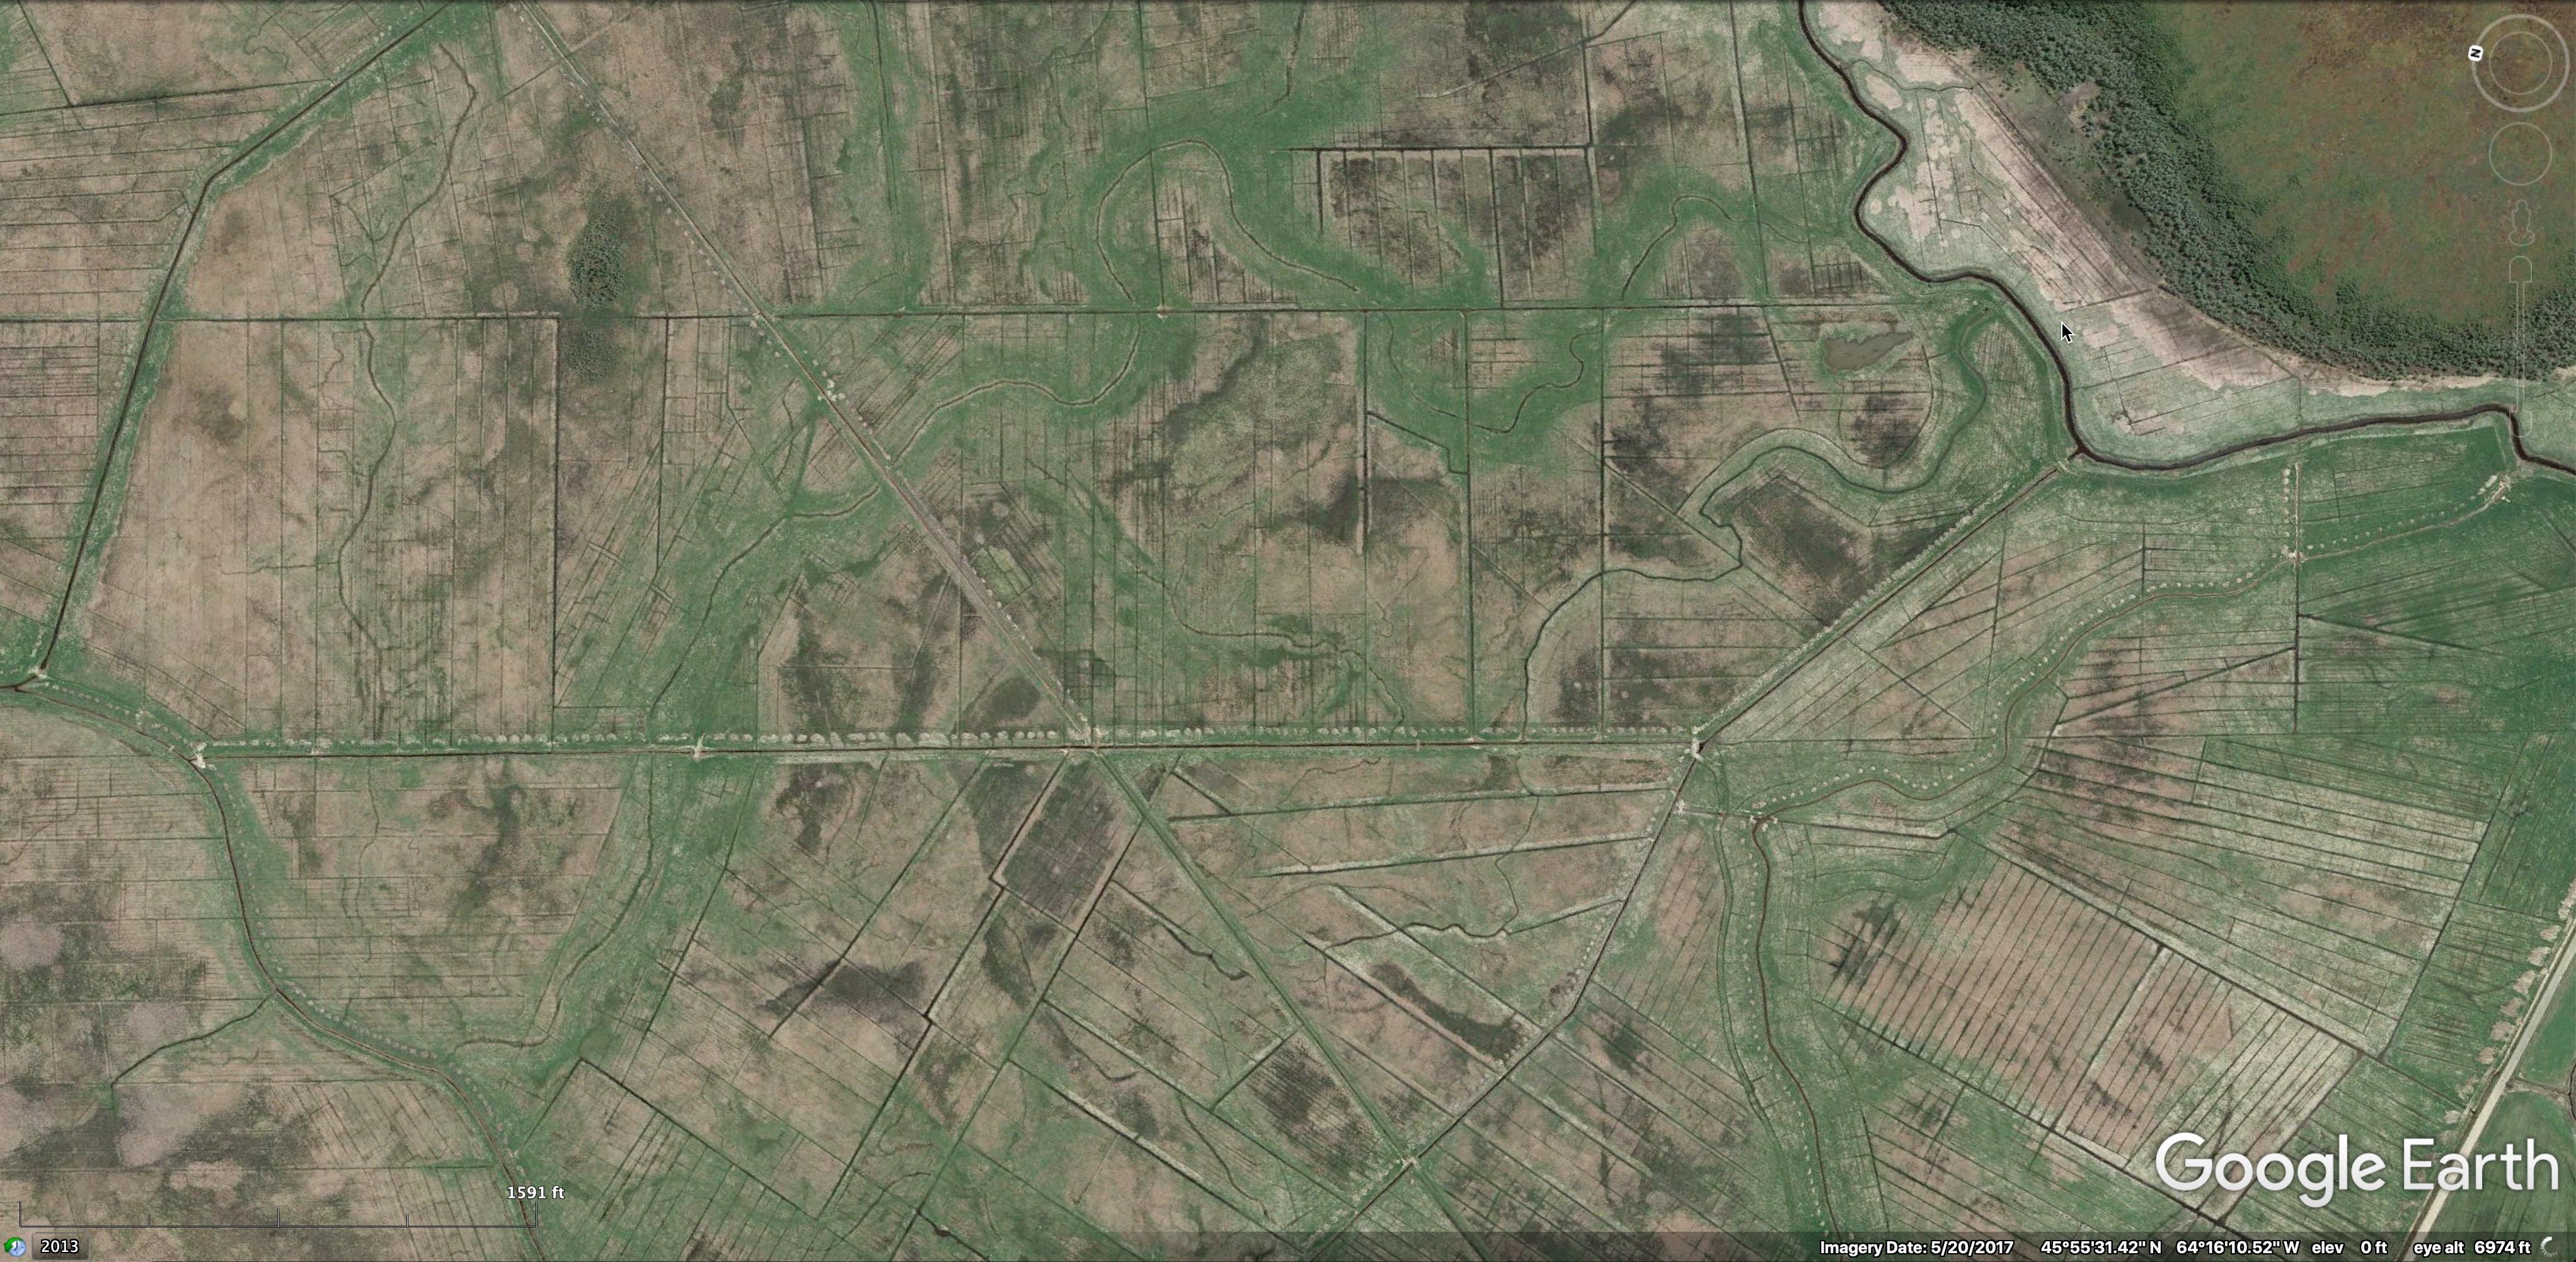 Google Earth Pro 2020-09-19 16-32-09.jpg